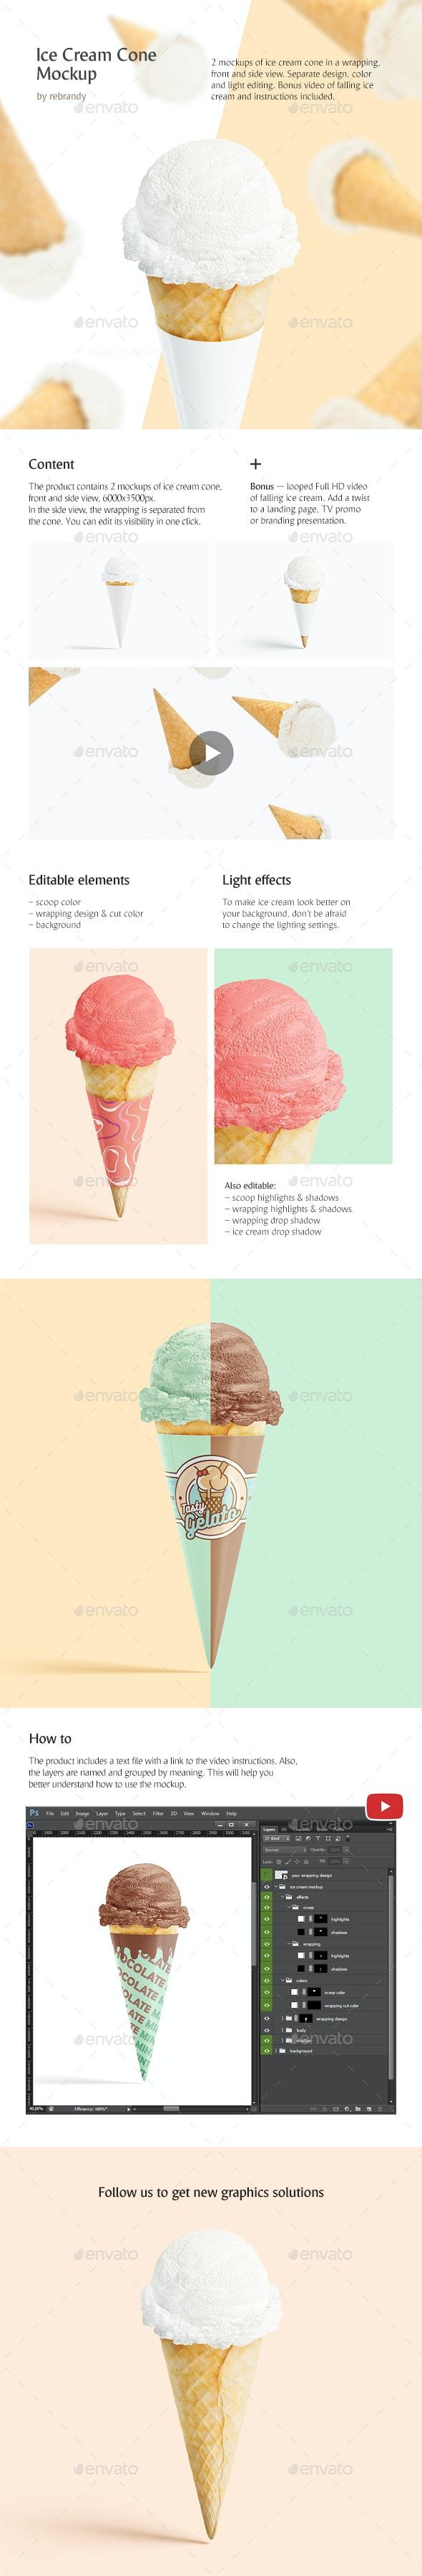 Ice Cream Cone Mockup - Product Mock-Ups Graphics